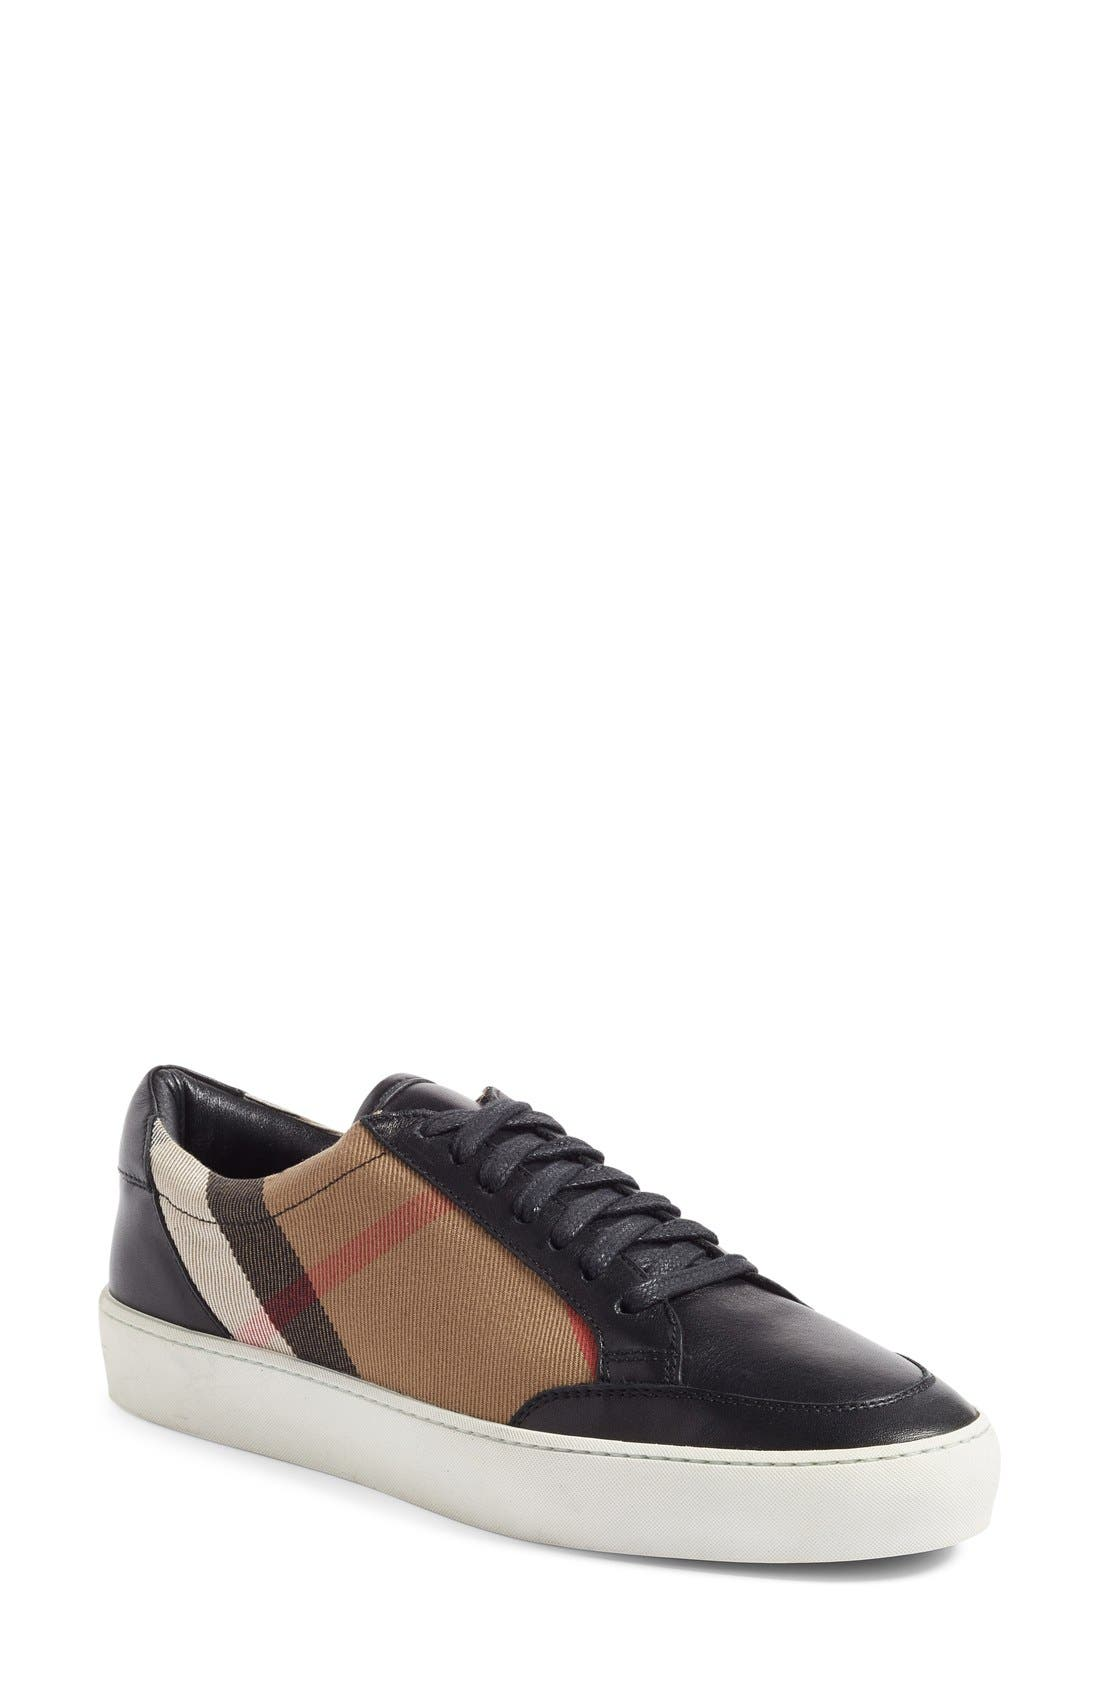 Main Image - Burberry Salmond Sneaker (Women)